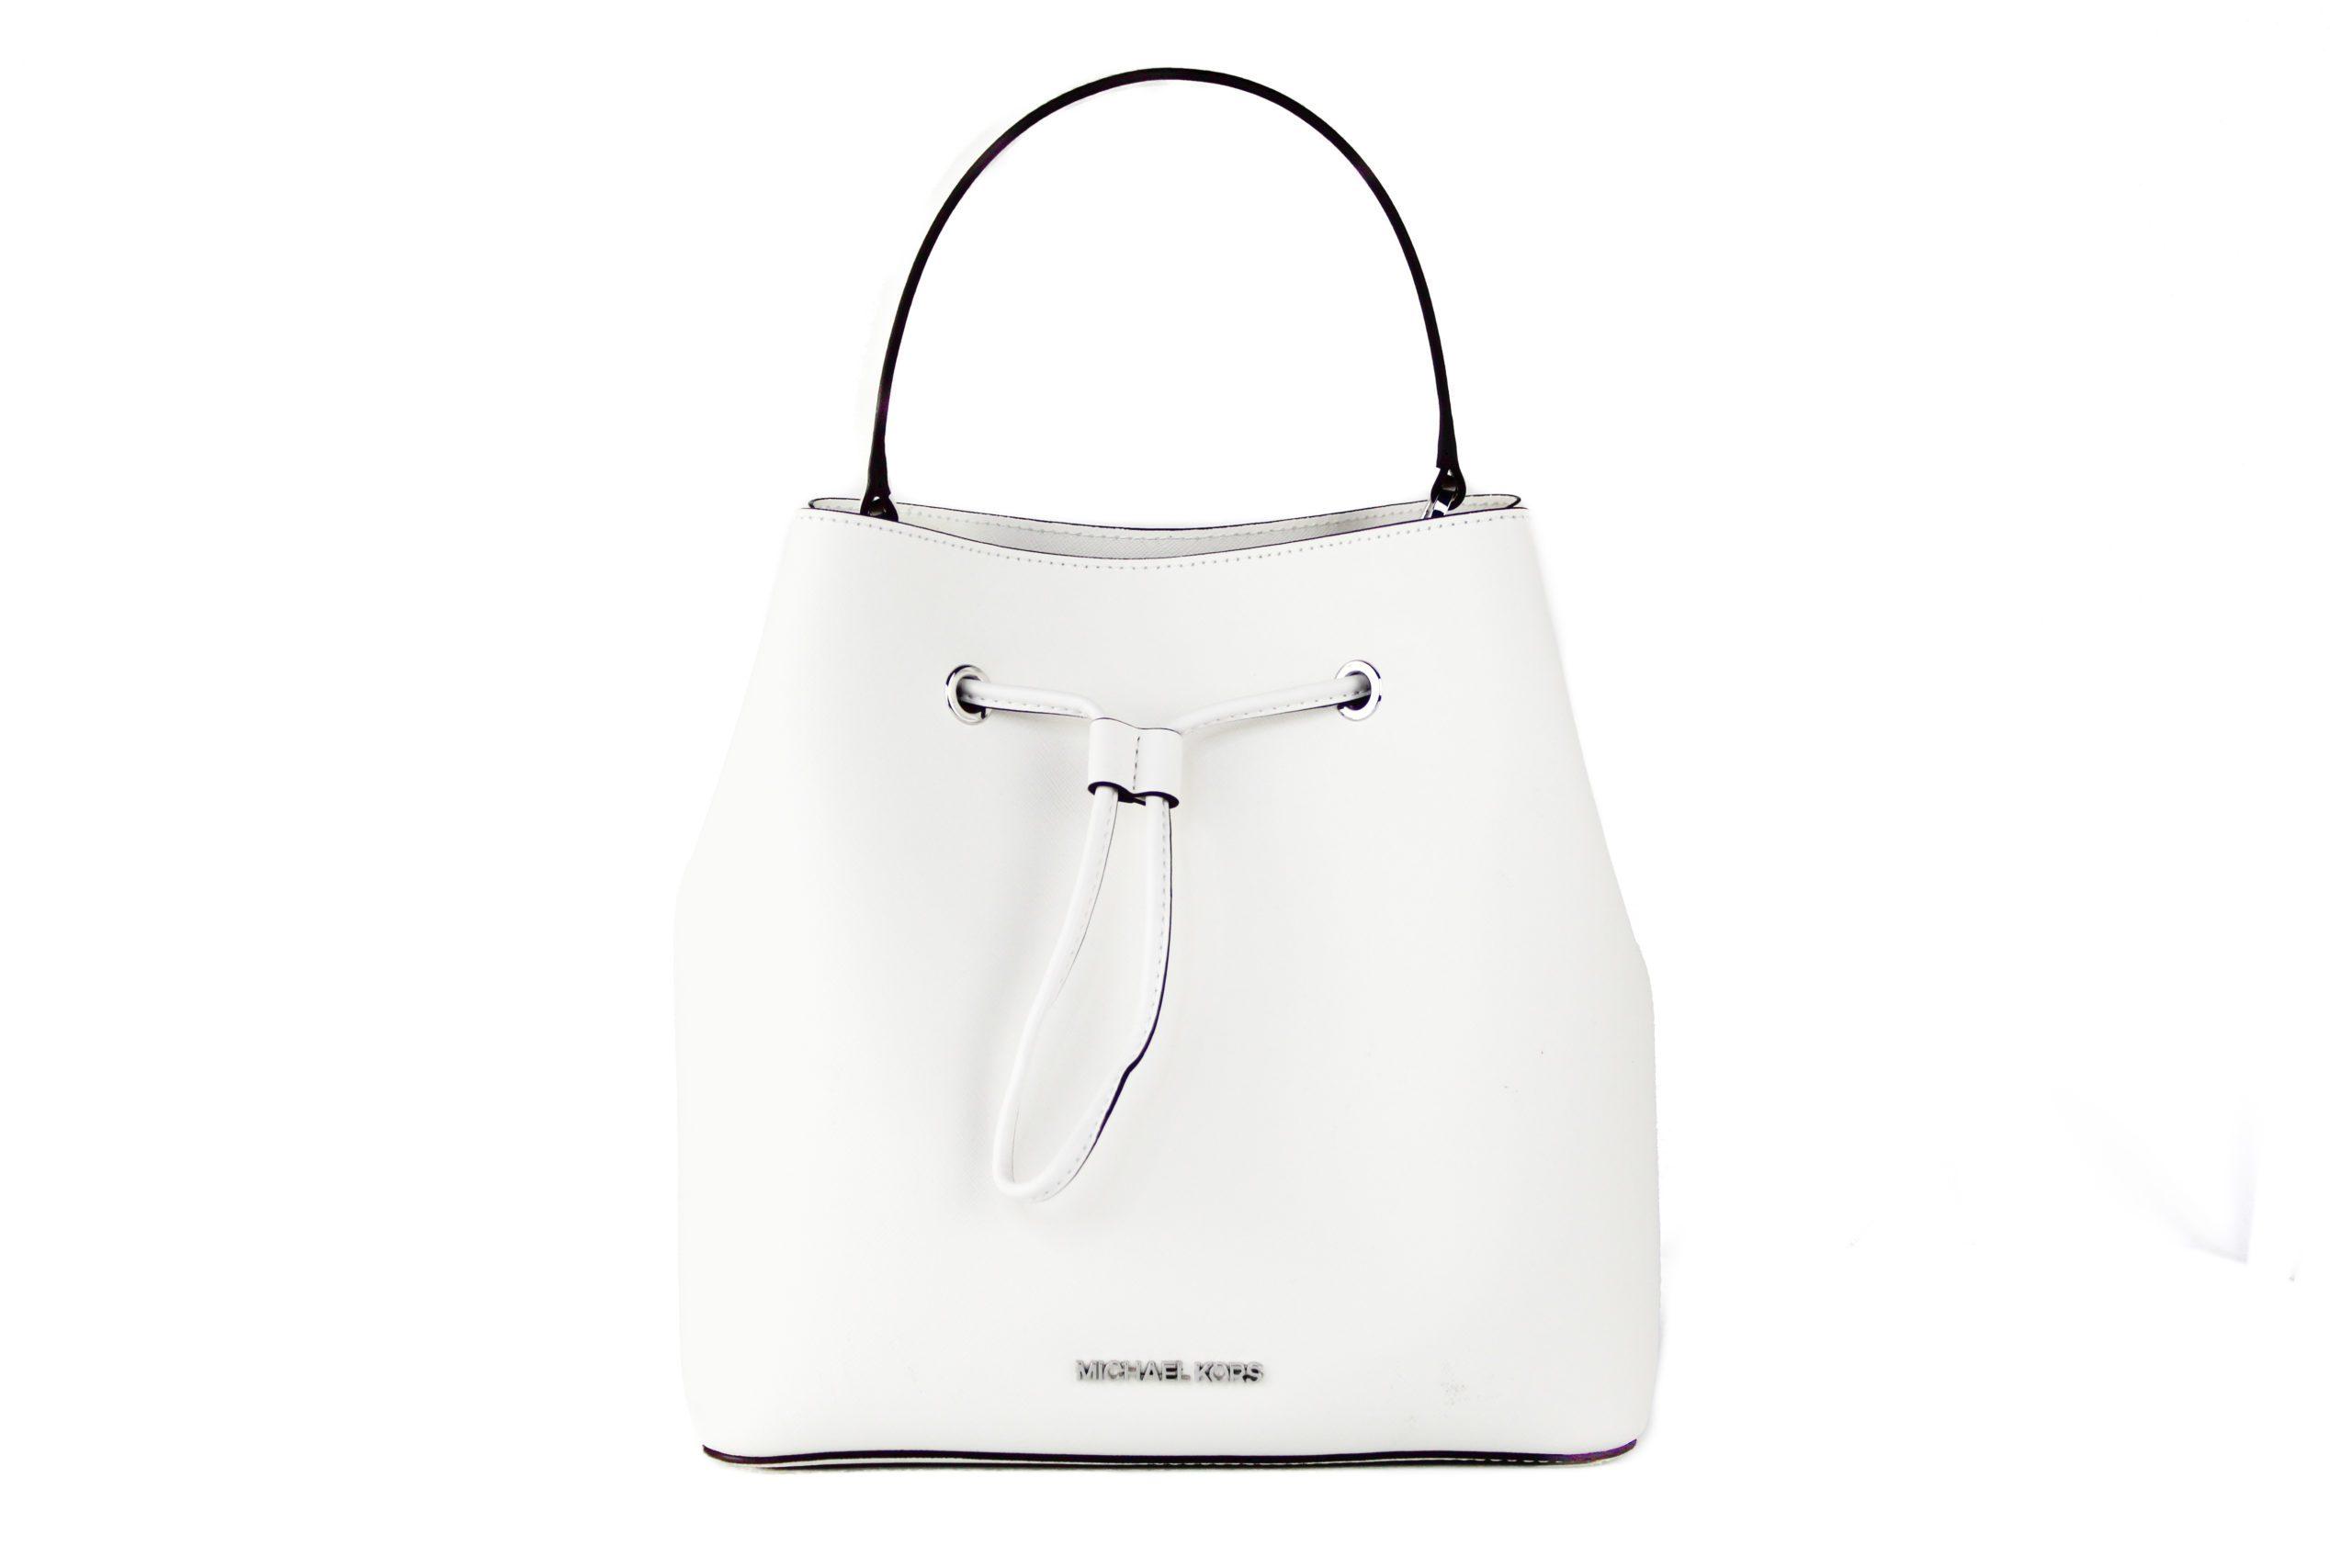 Michael Kors Women's Suri Large Leather Bucket Crossbody Bag White 57933